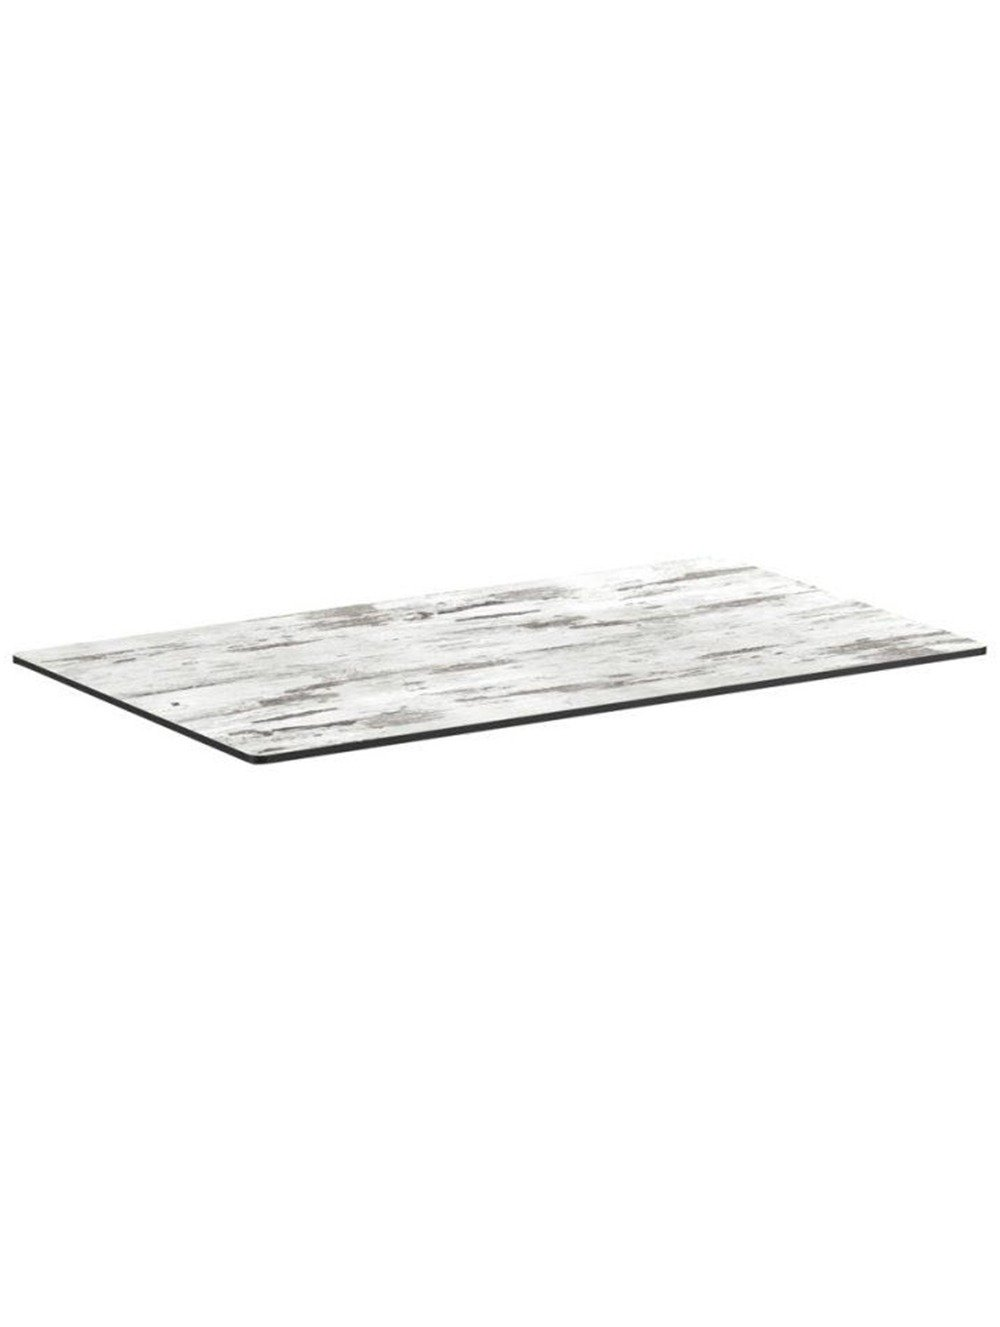 vintage laminate rectangle